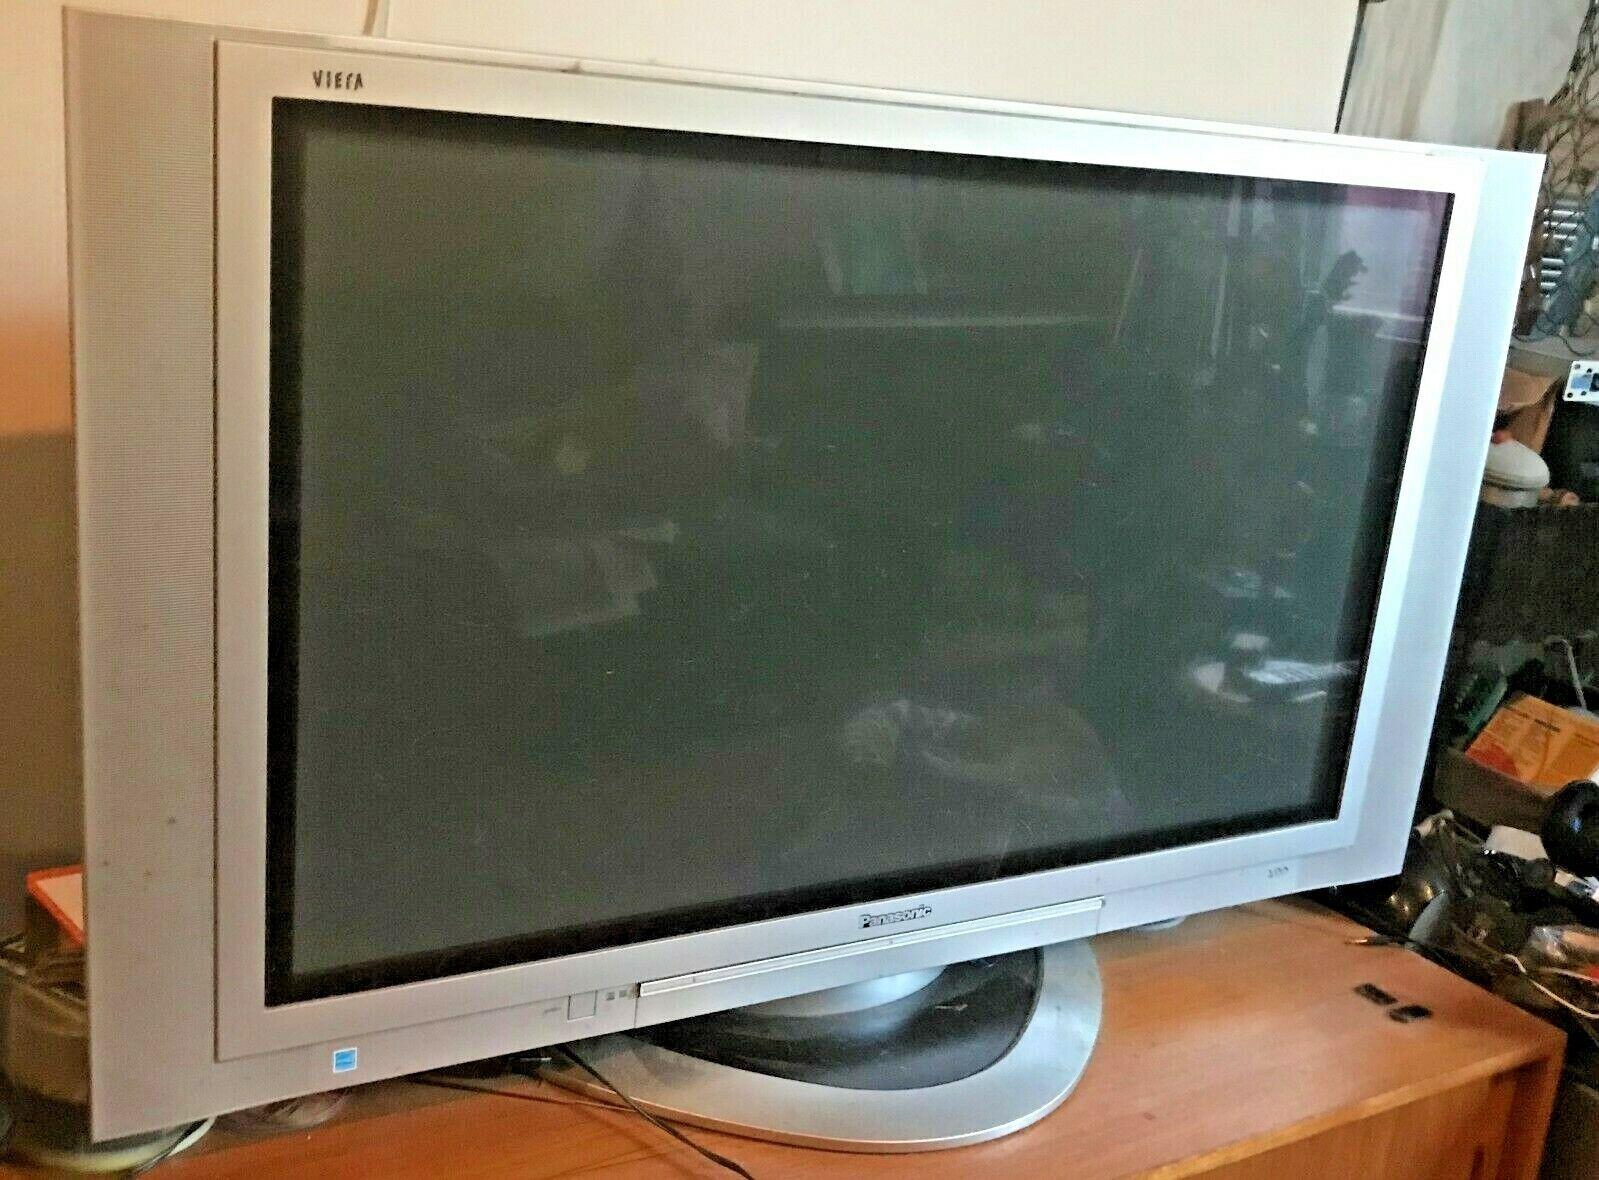 Panasonic Viera TH-42PA25 42 -inch Plasma Television